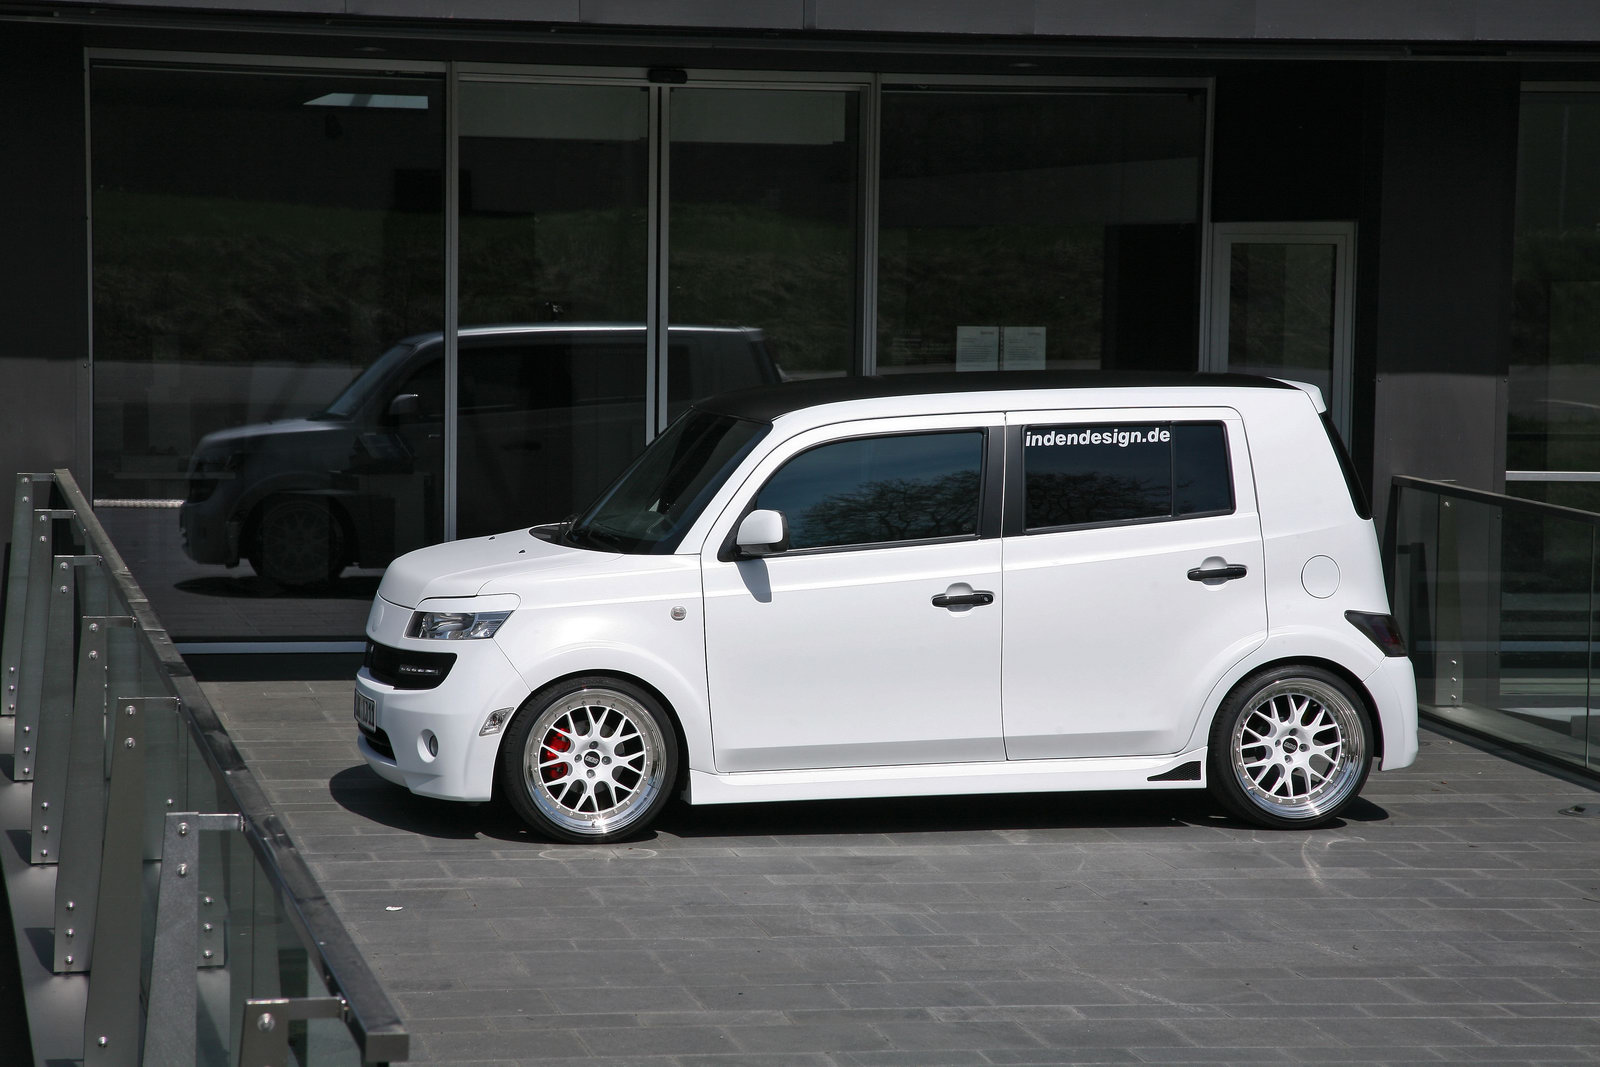 Toyota toyota cube : Daihatsu Materia Icecube by Inden Design: Euro-Tuning for Scion ...